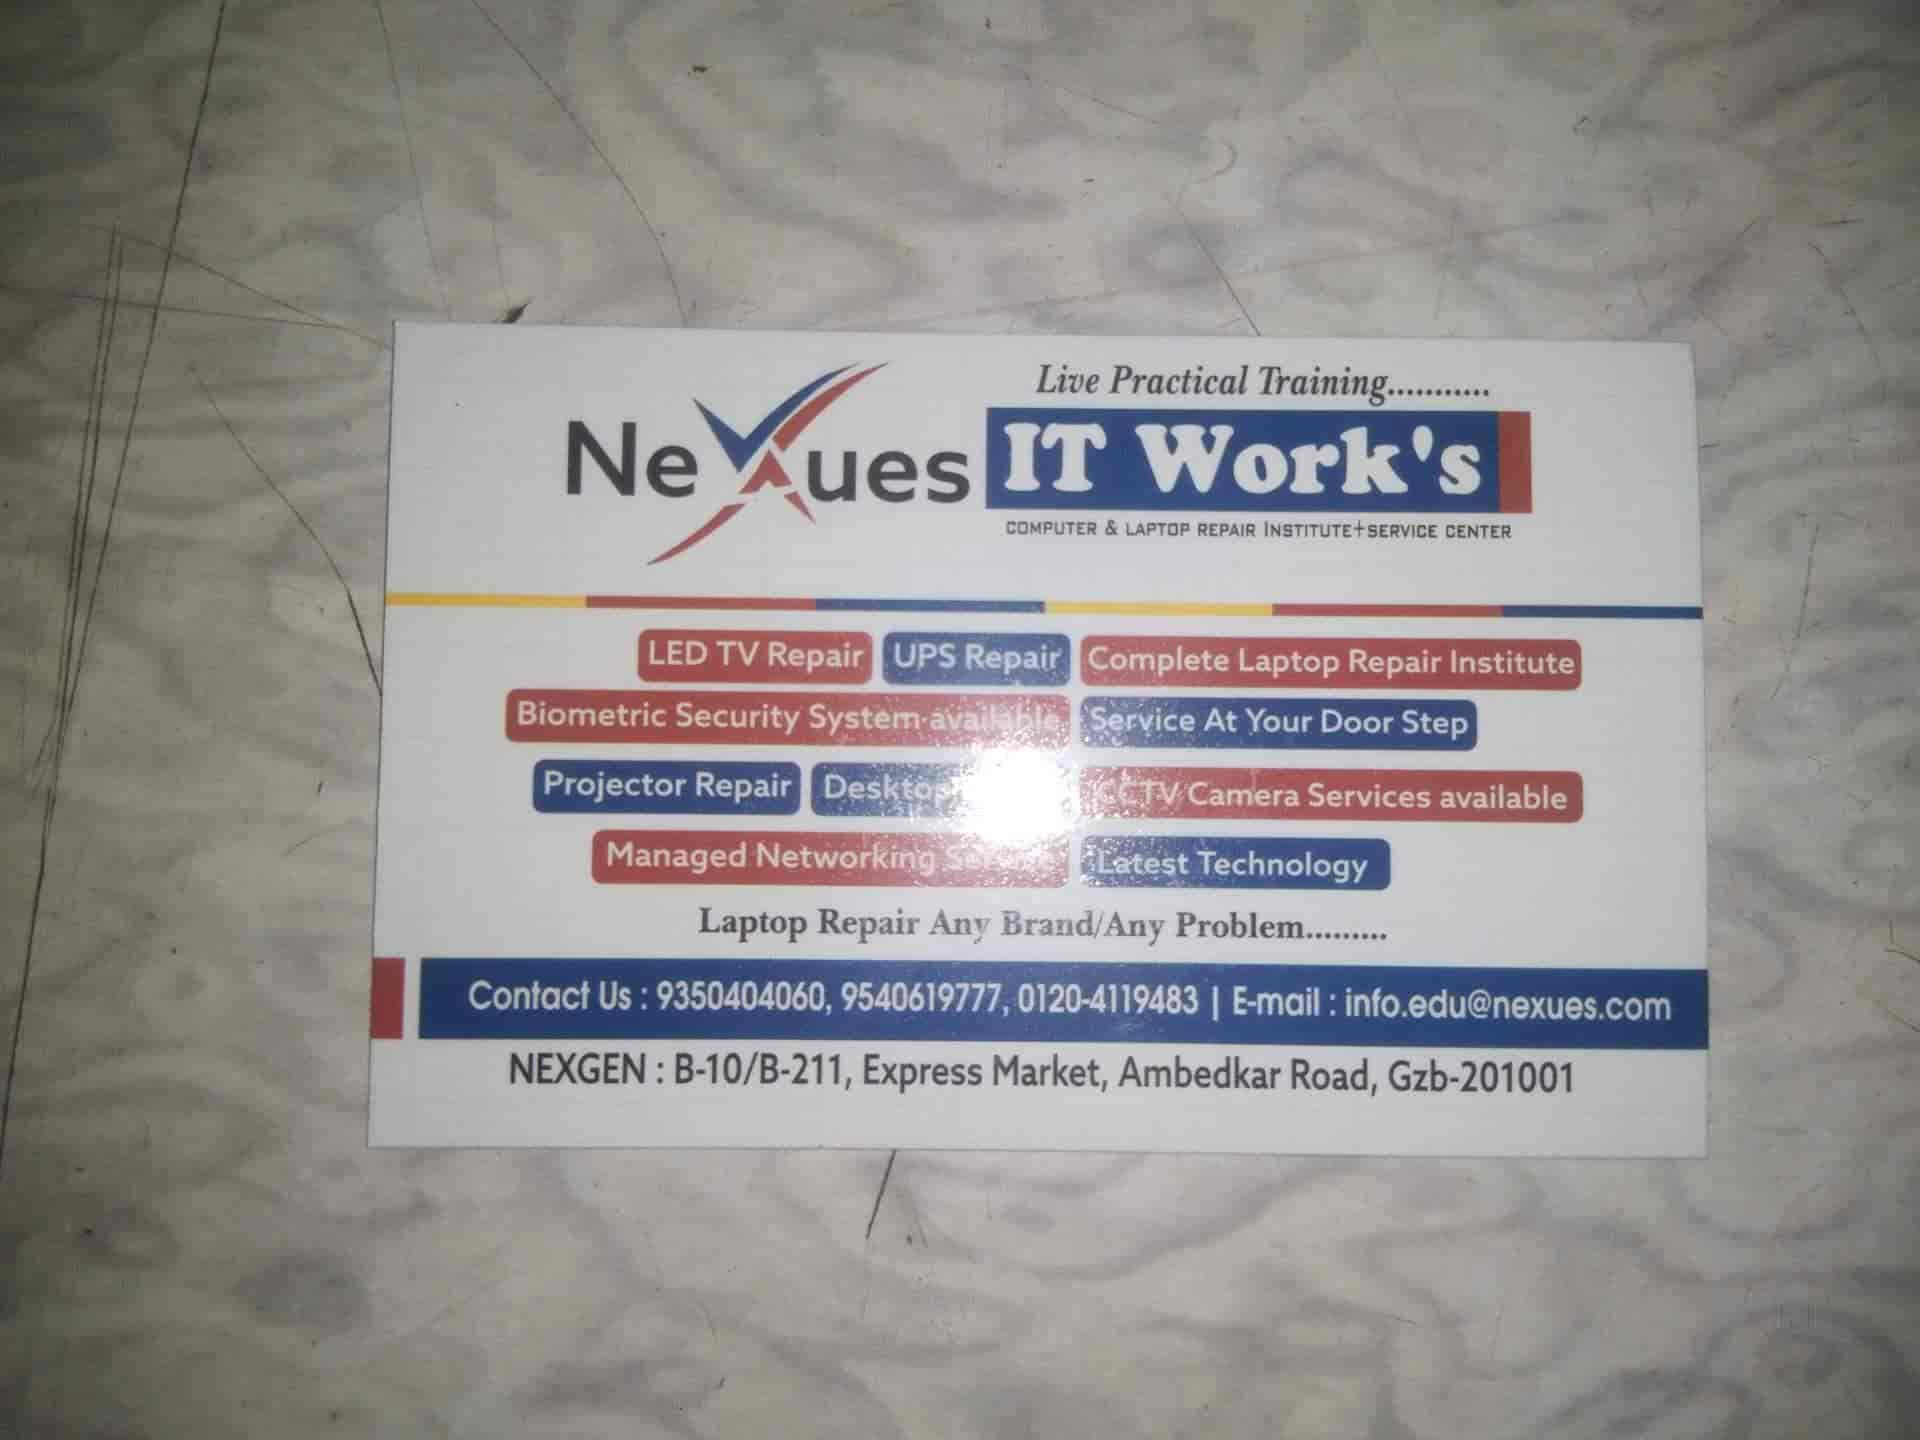 Nexues IT Work, Ambedkar Road - Computer Repair & Services